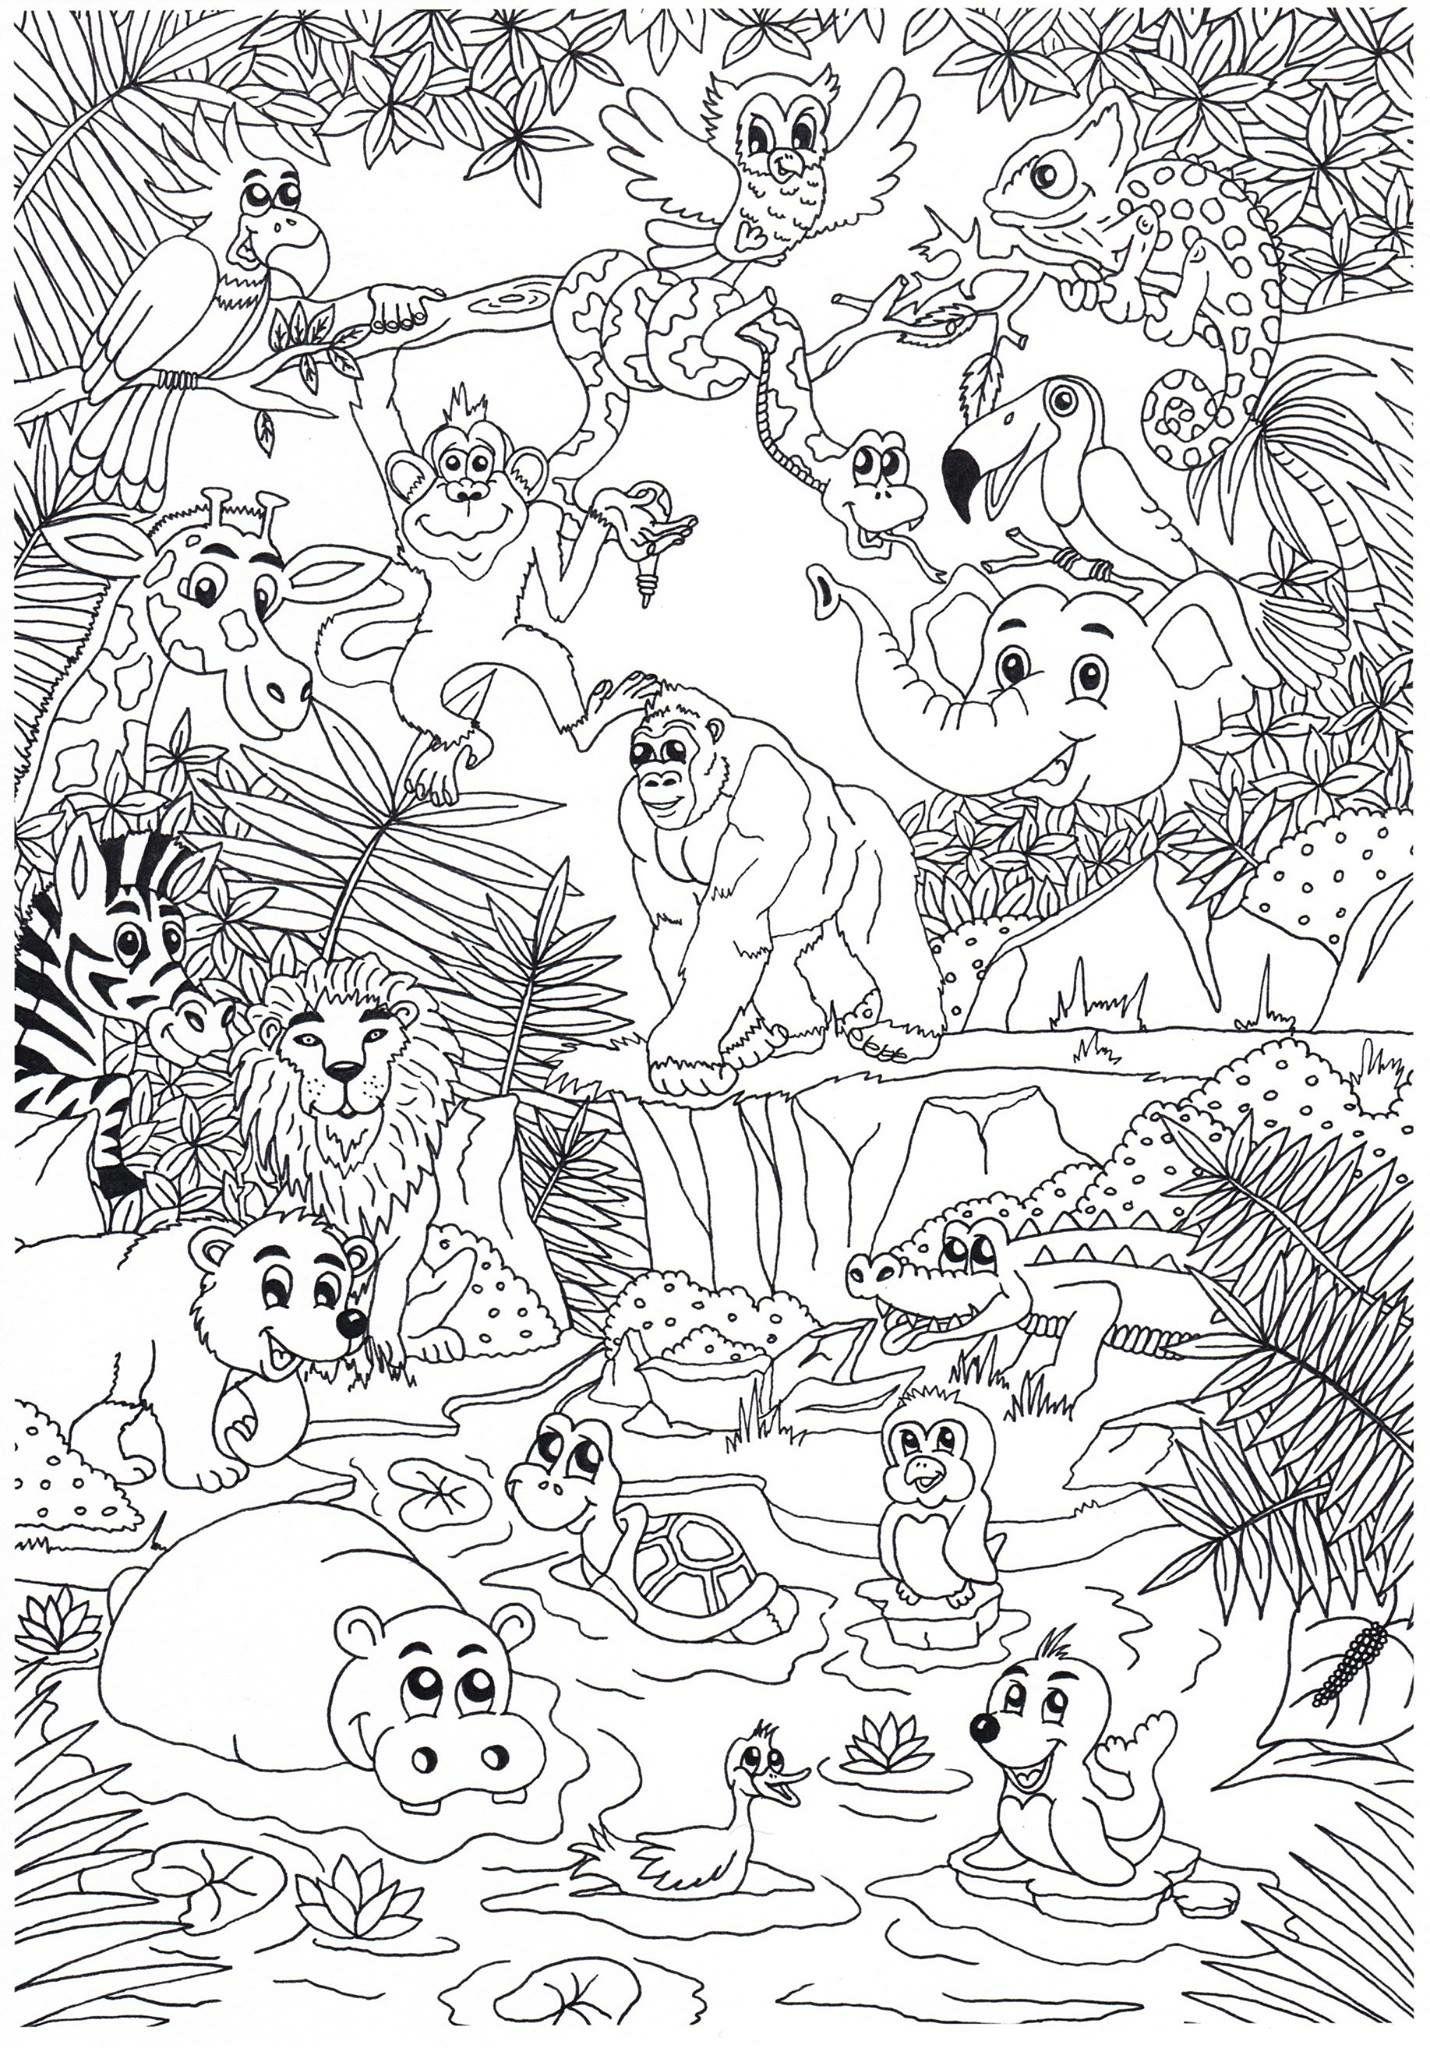 Pin By H Sprangers On Kleurplaten Zoo Coloring Pages Jungle Coloring Pages Zoo Animal Coloring Pages